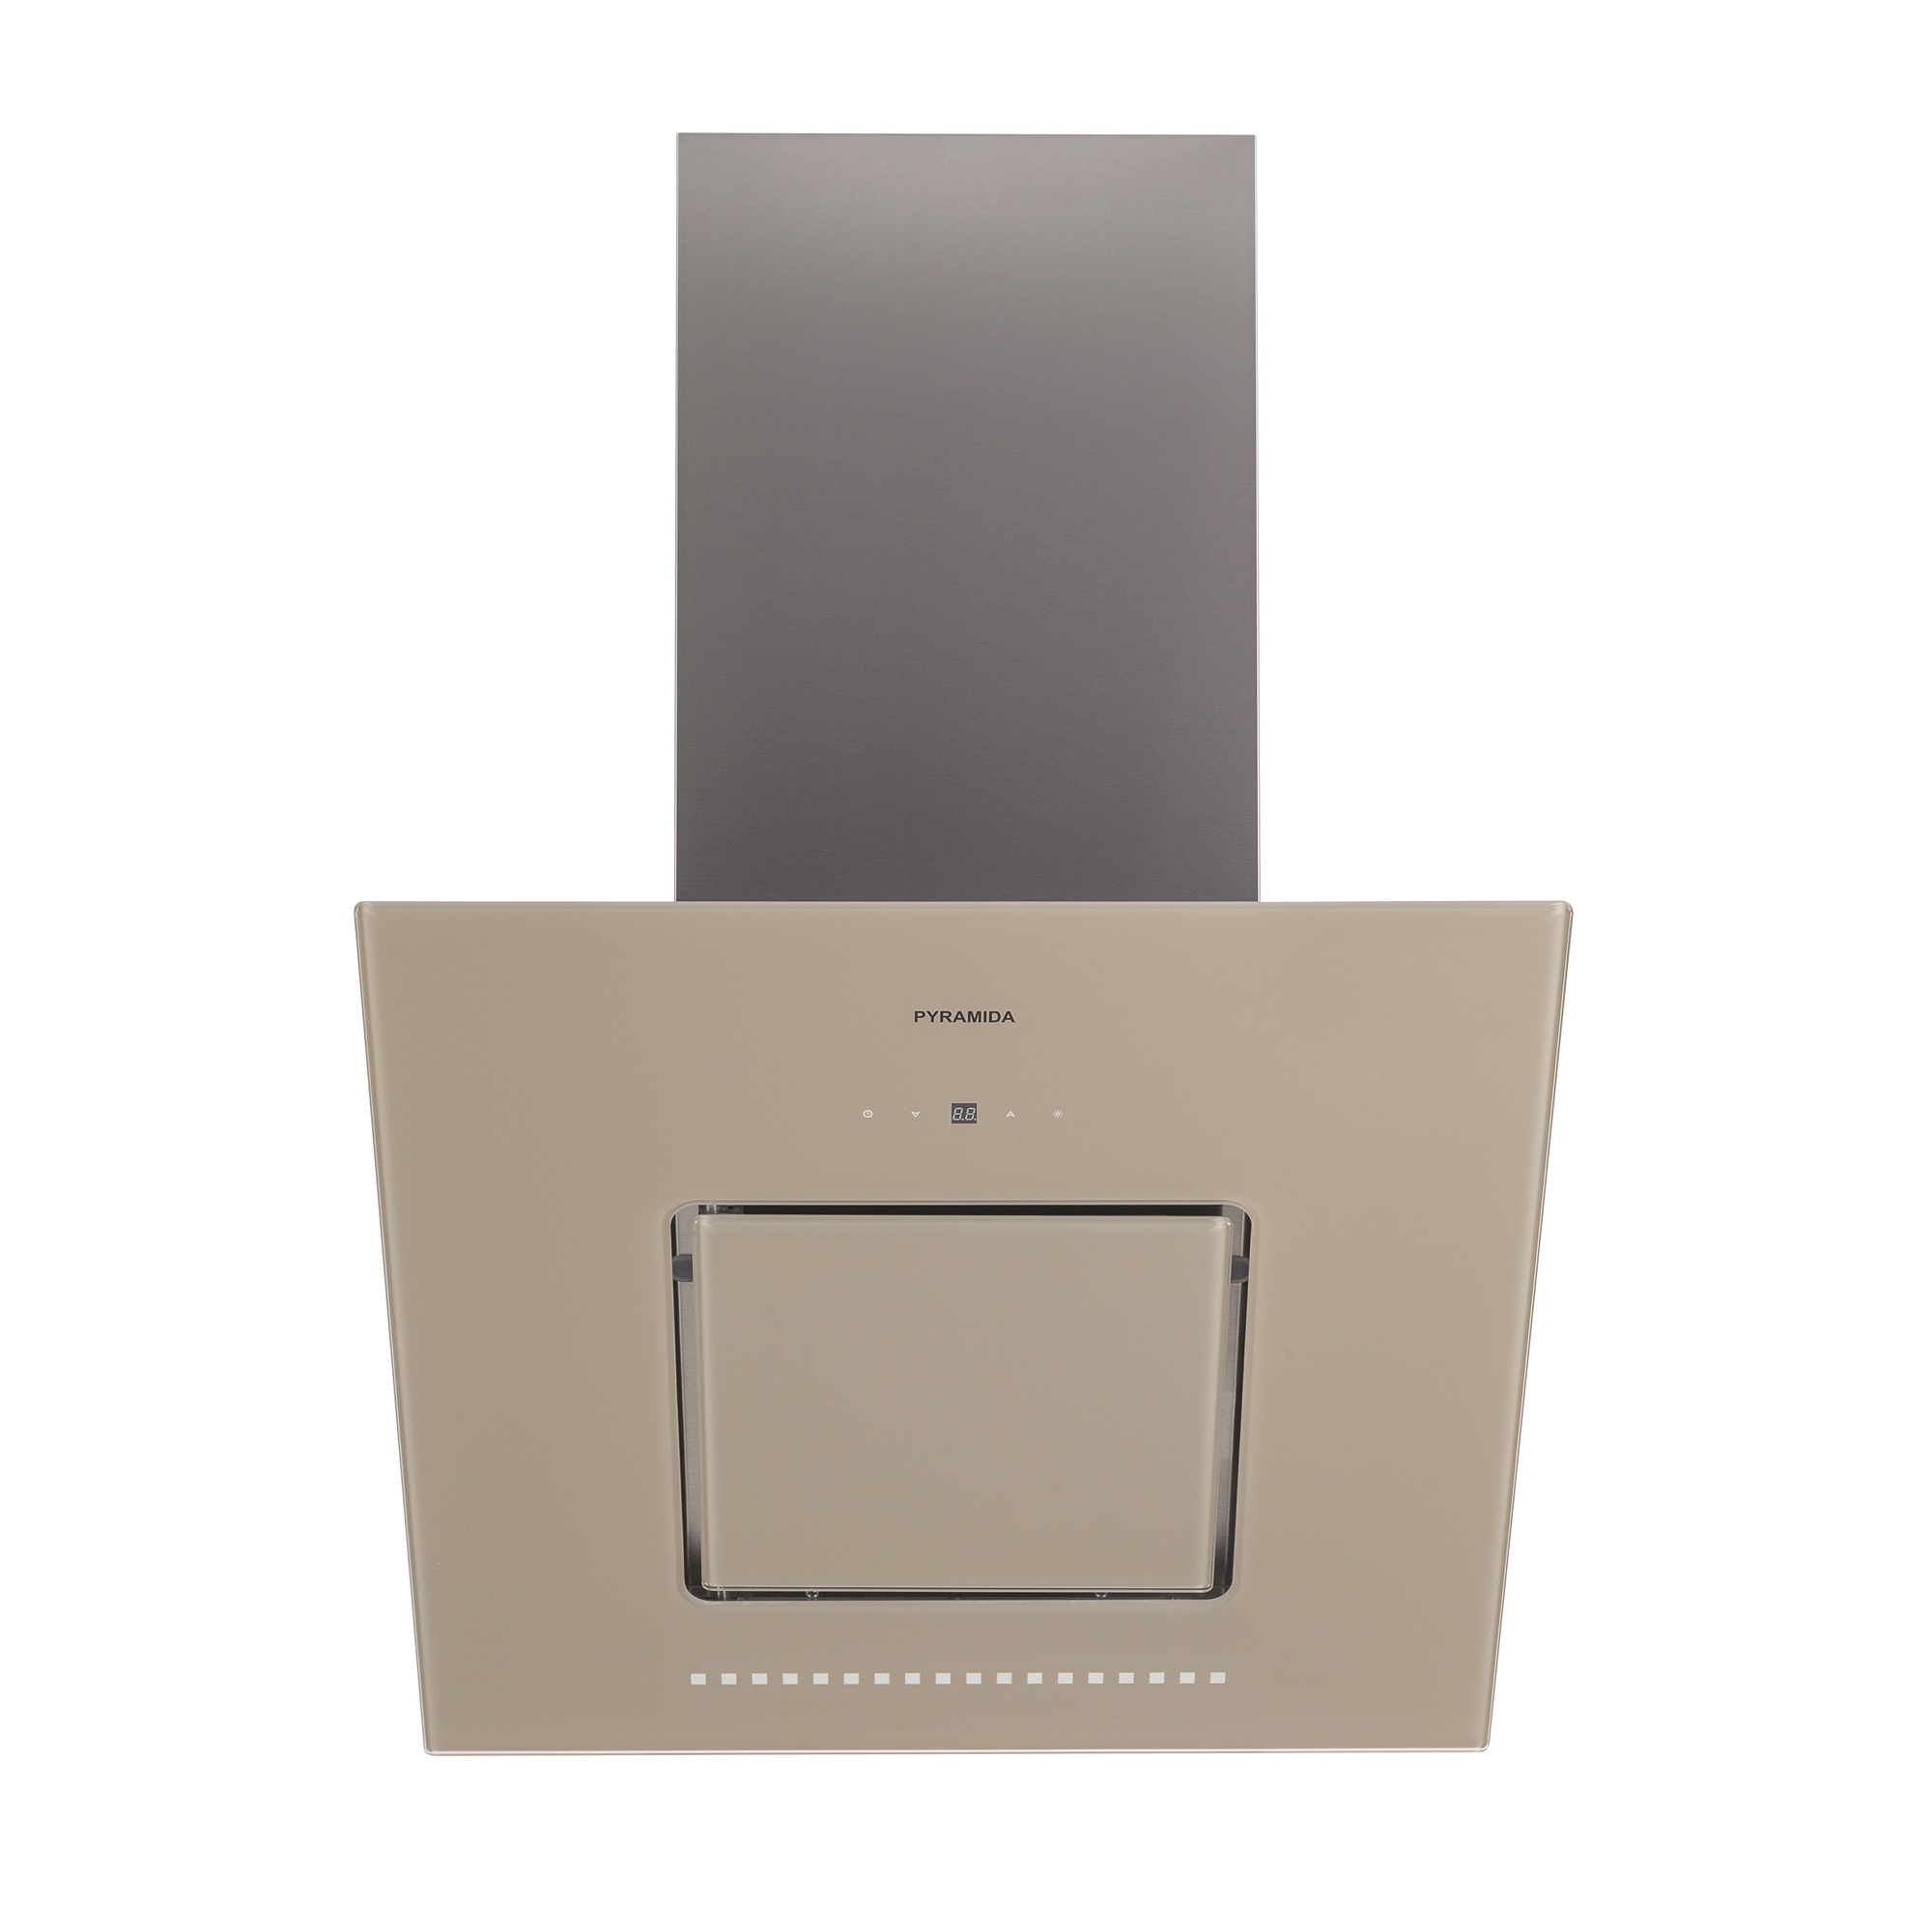 все цены на Вытяжка Pyramida Hes 30 (c-600 mm) sand /aj онлайн